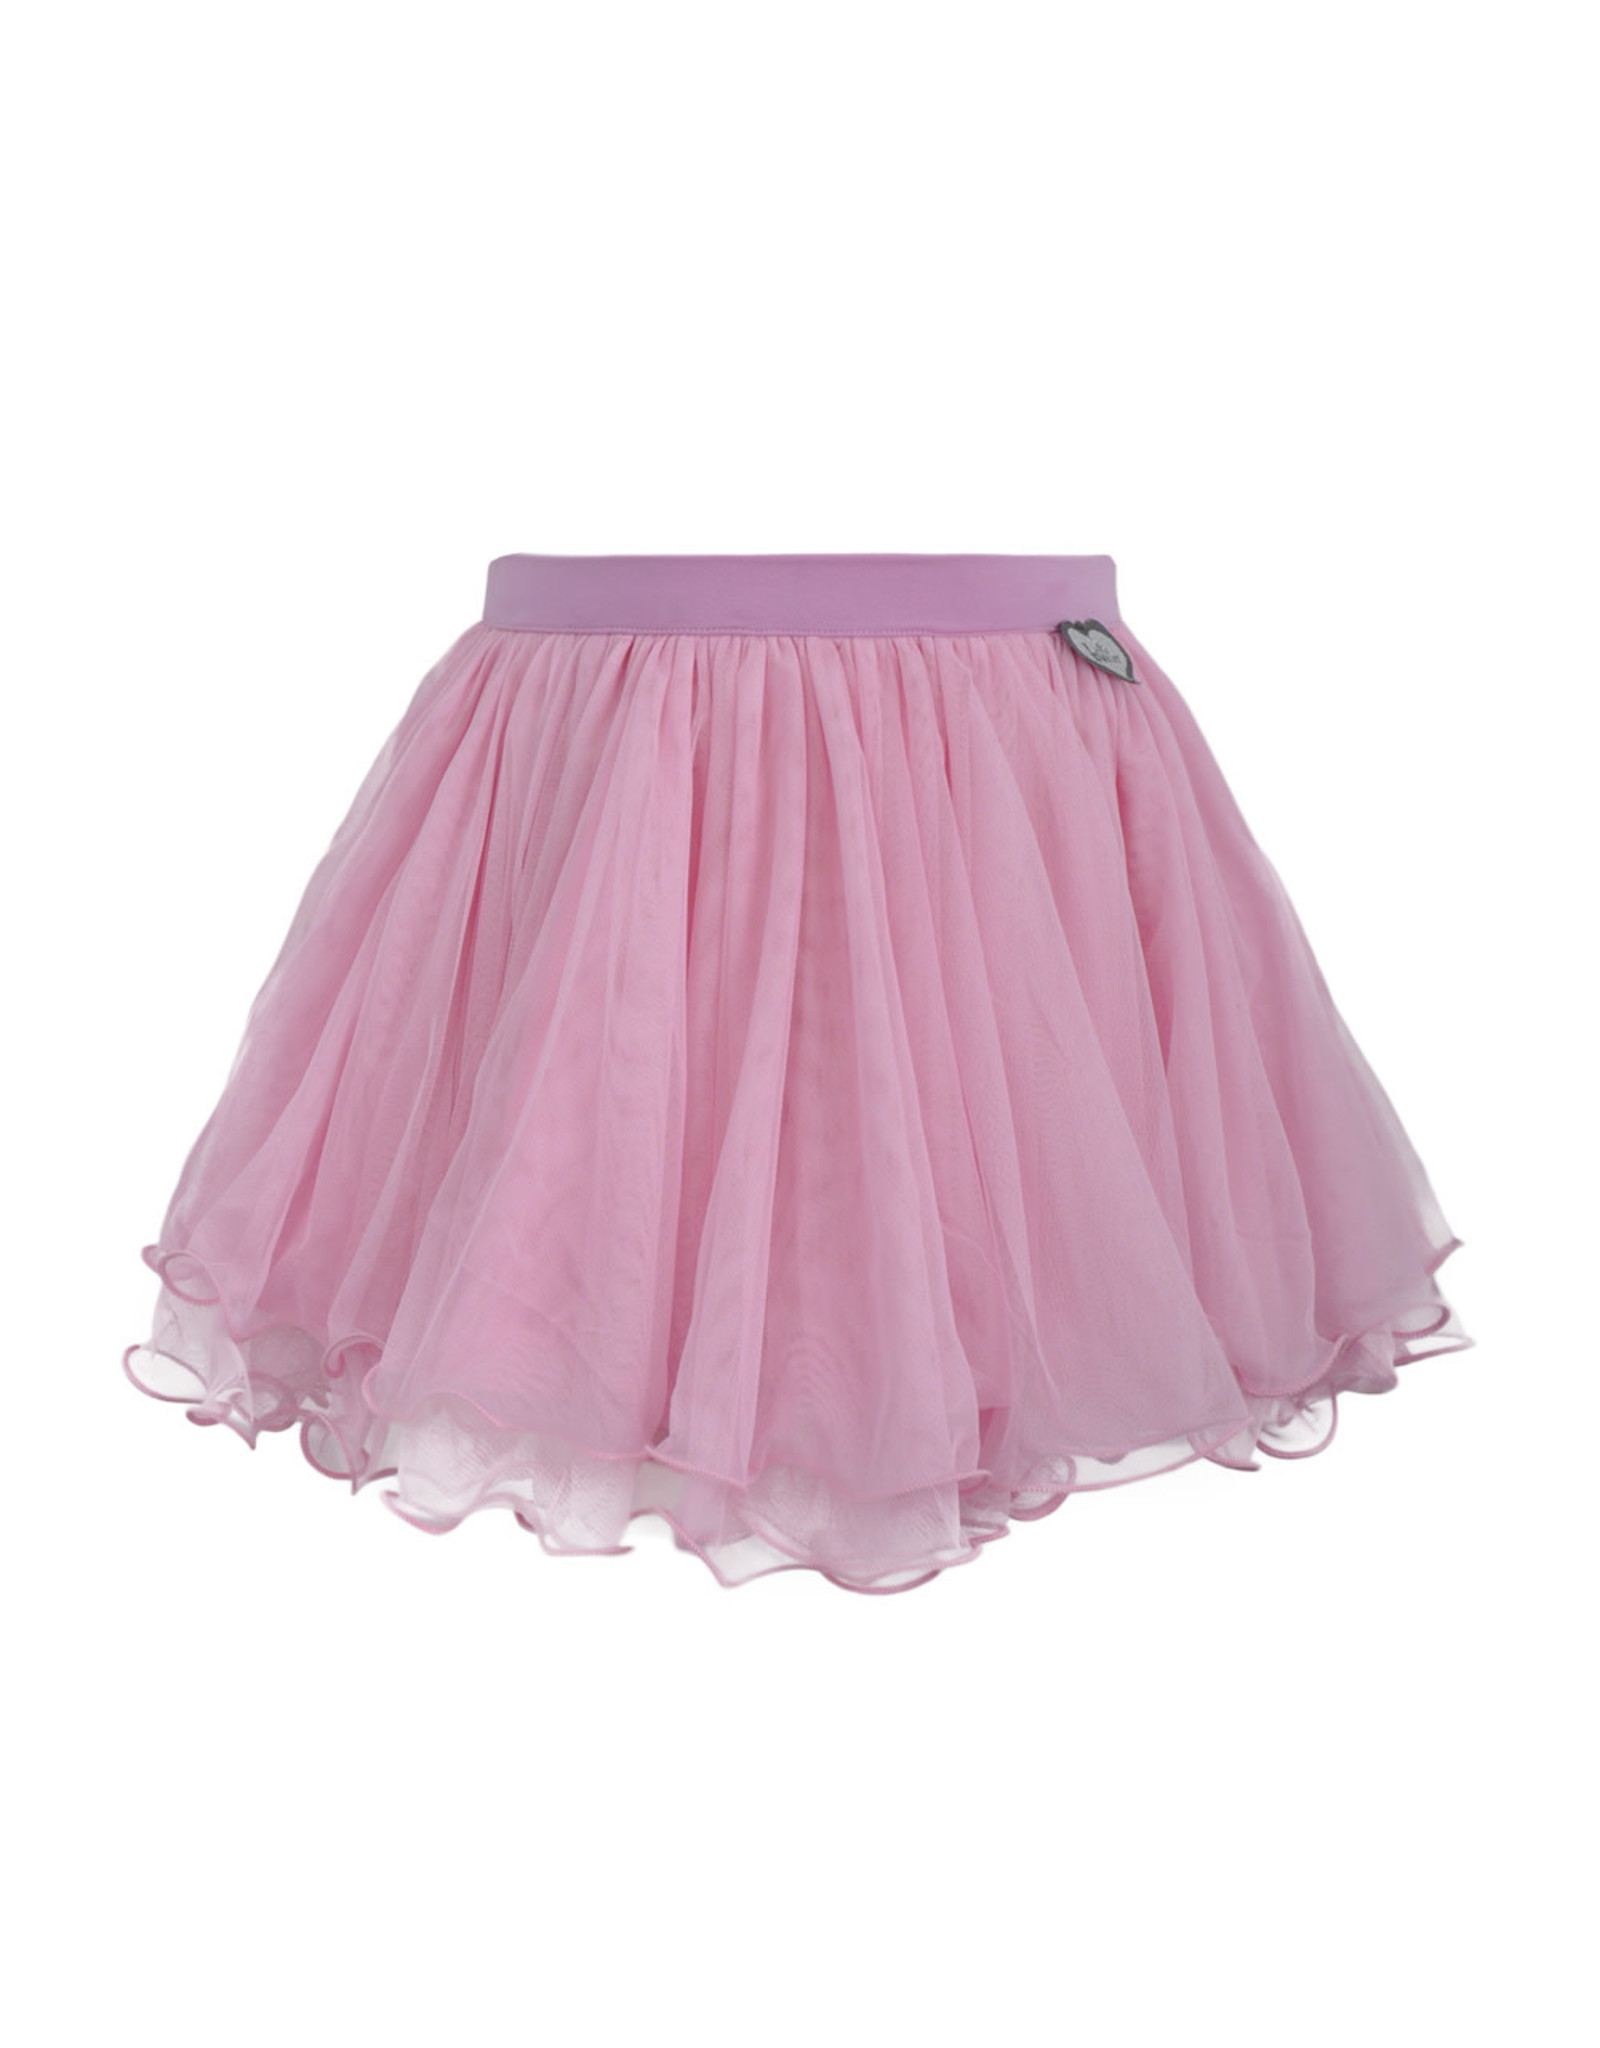 LoFff Loff meiden petticoat rok Bubblegum